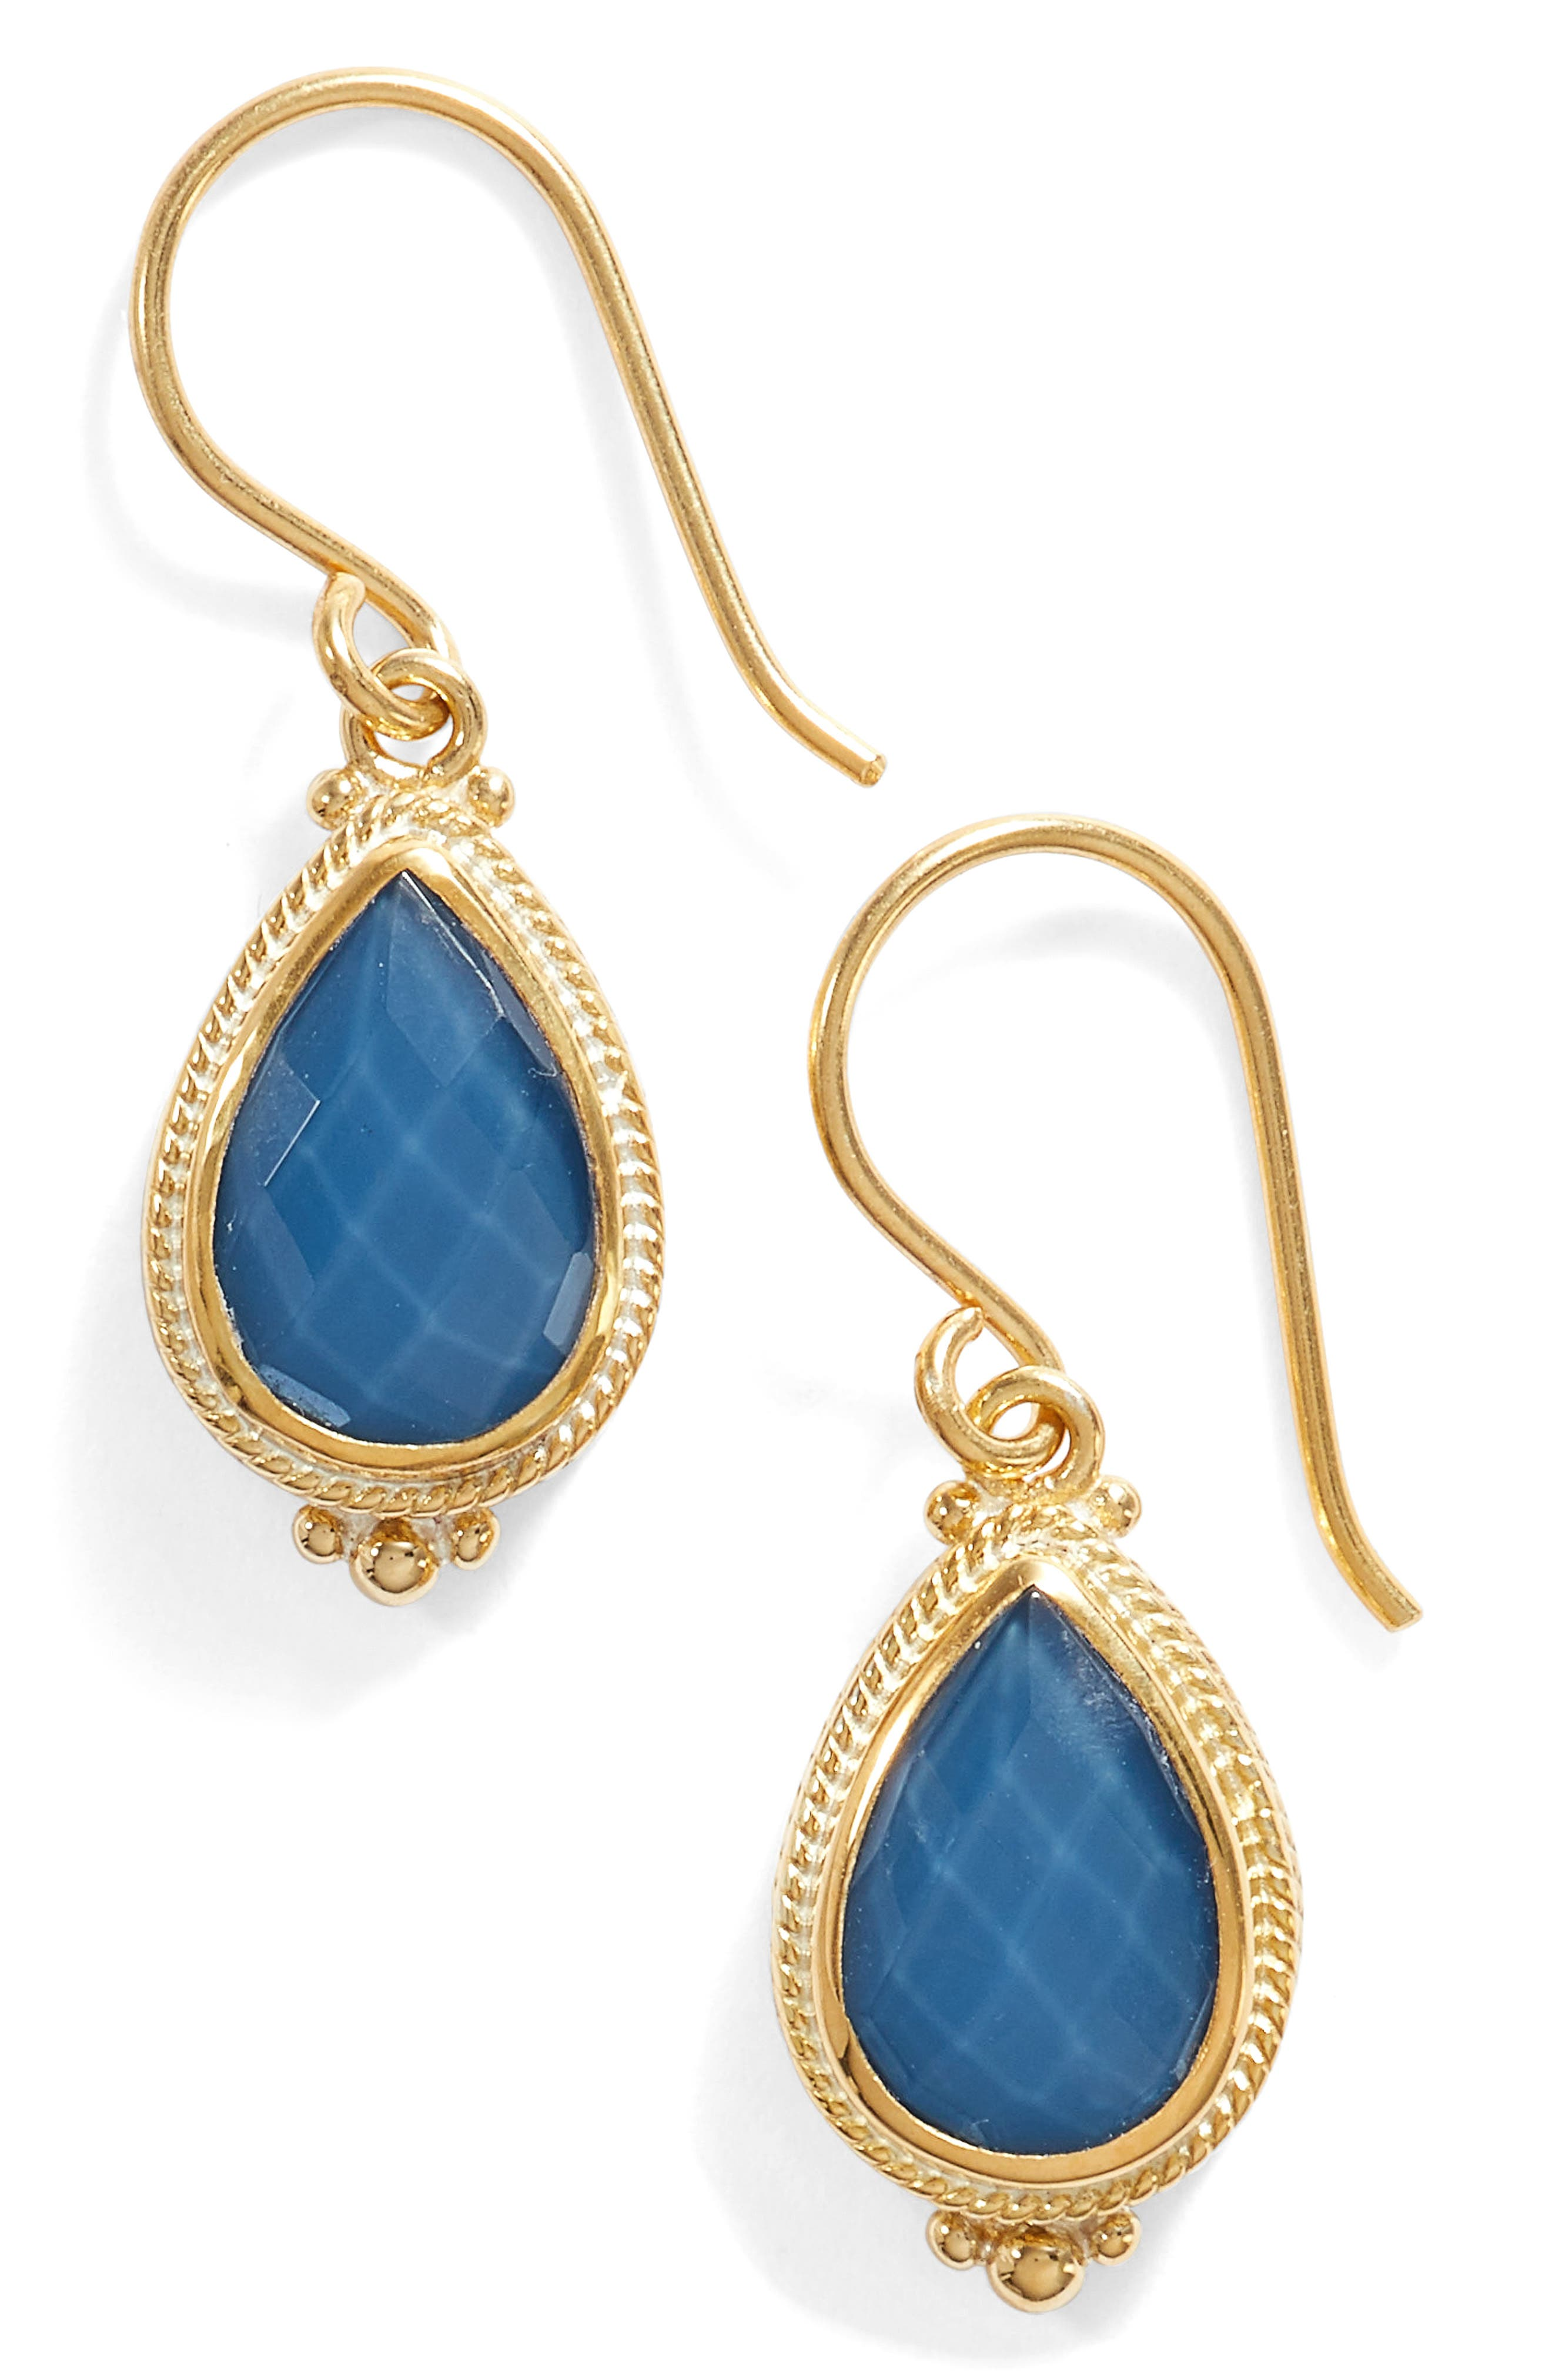 ANNA BECK Blue Quartz Small Teardrop Earrings